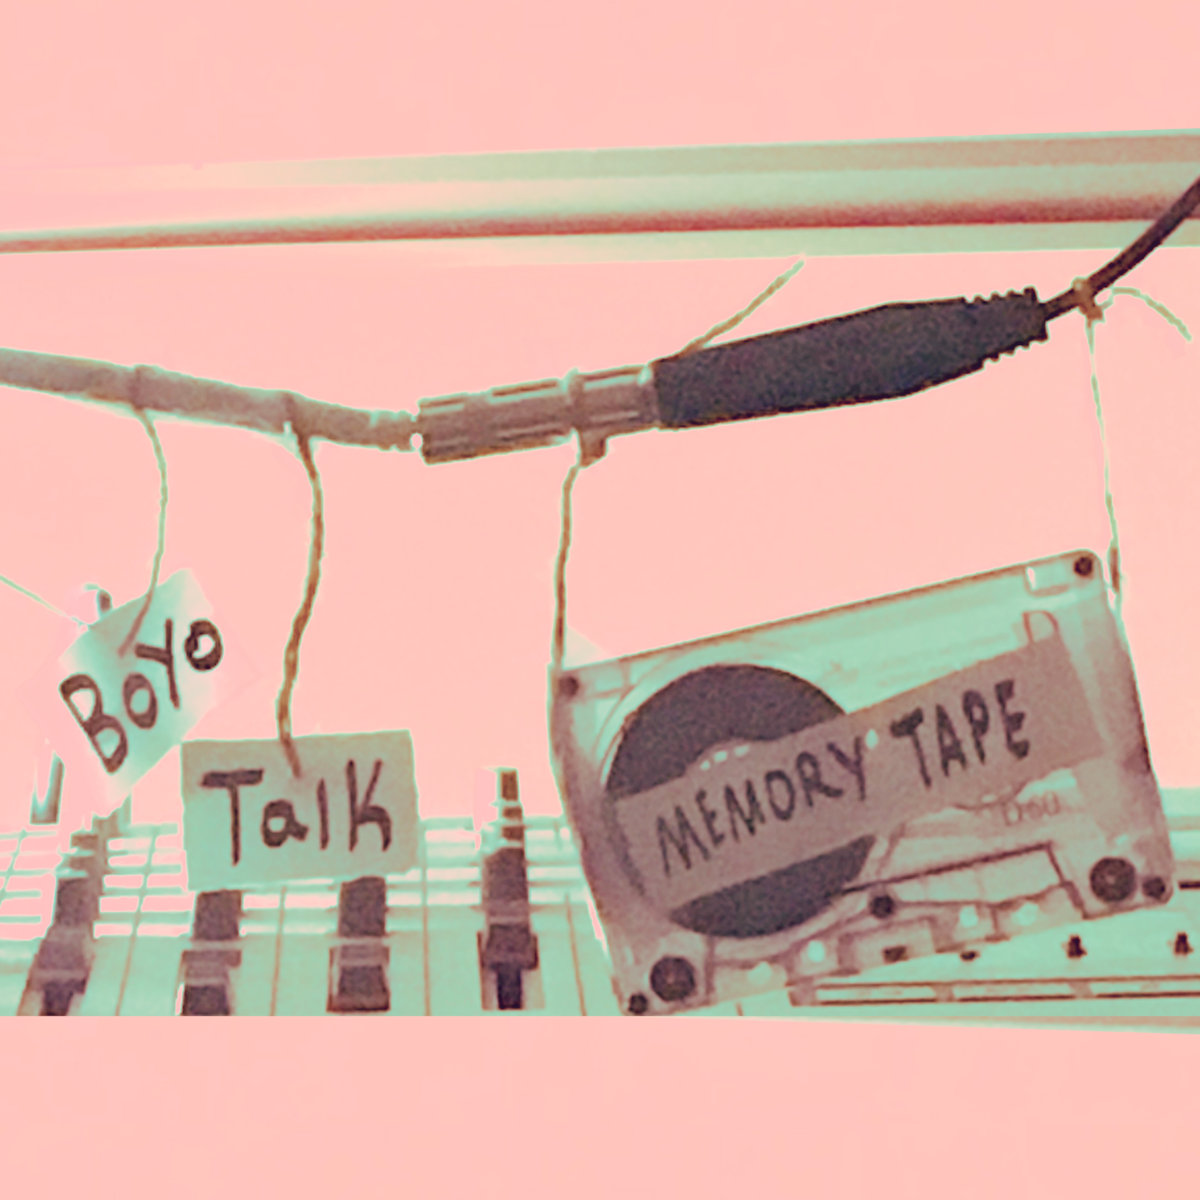 Boyo Talk – Memory Tape